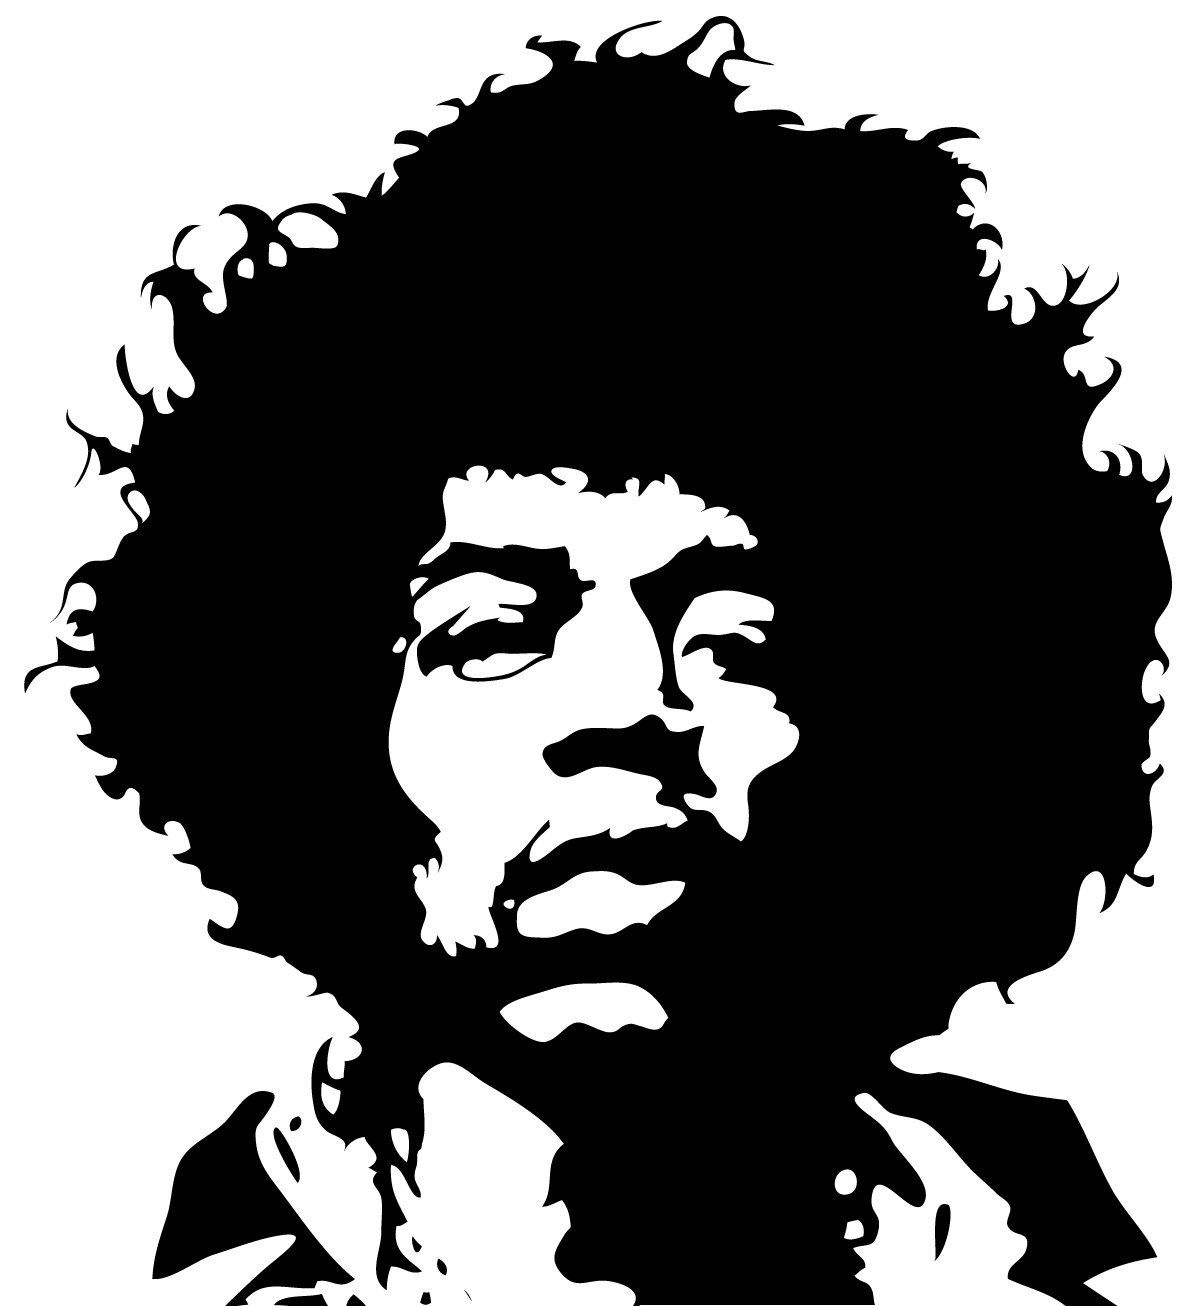 Amazon Com Wall Sticker Decal Jimi Hendrix Silhouette Decoration Glossy Black Vinyl Jimi Hendrix Silhouettes Gatekunst [ 1306 x 1203 Pixel ]